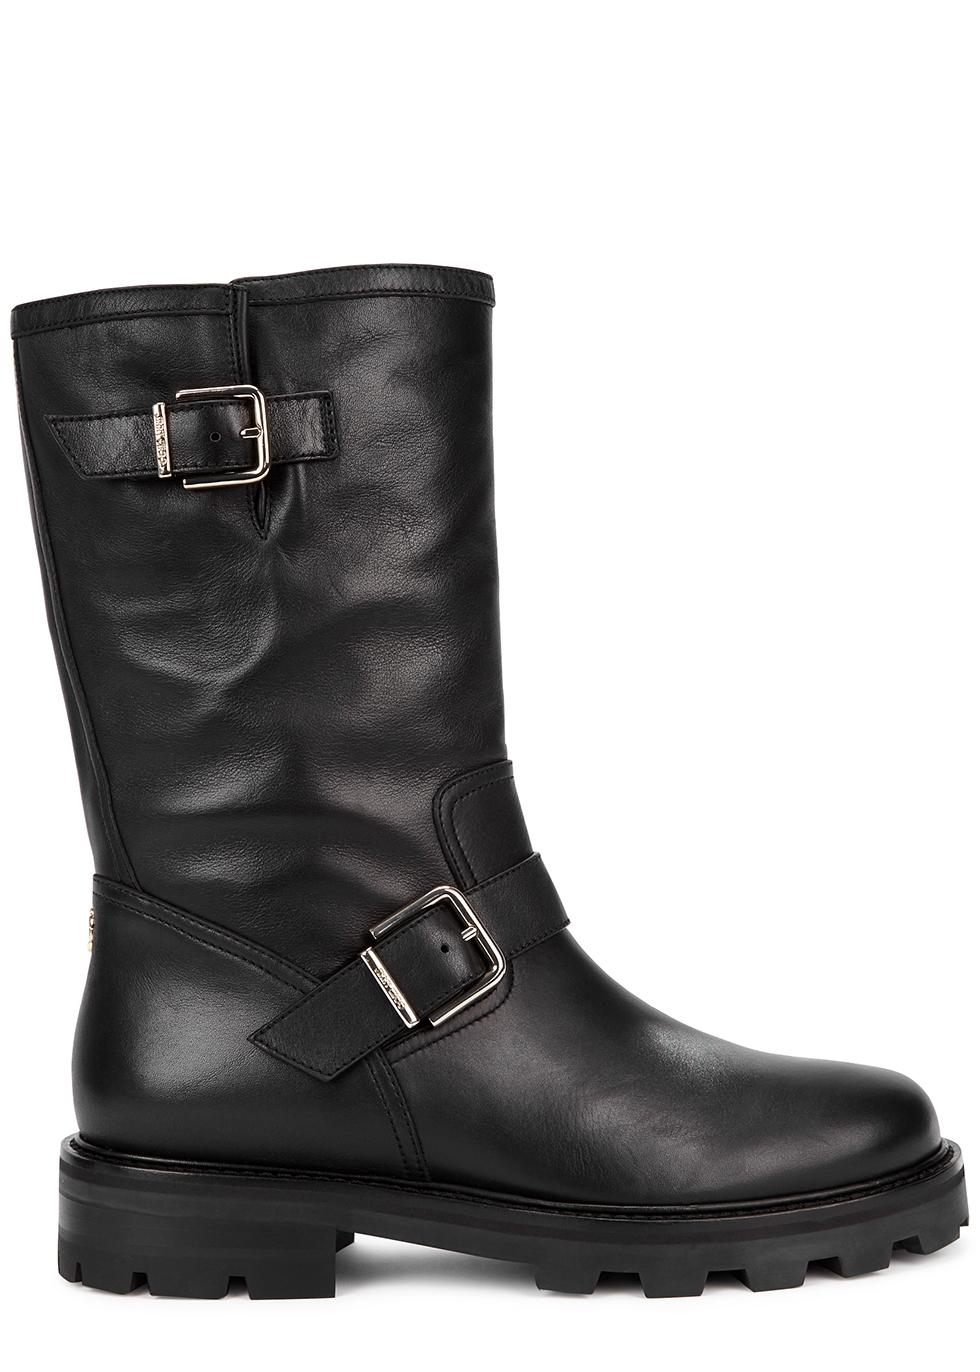 Biker II black leather ankle boots